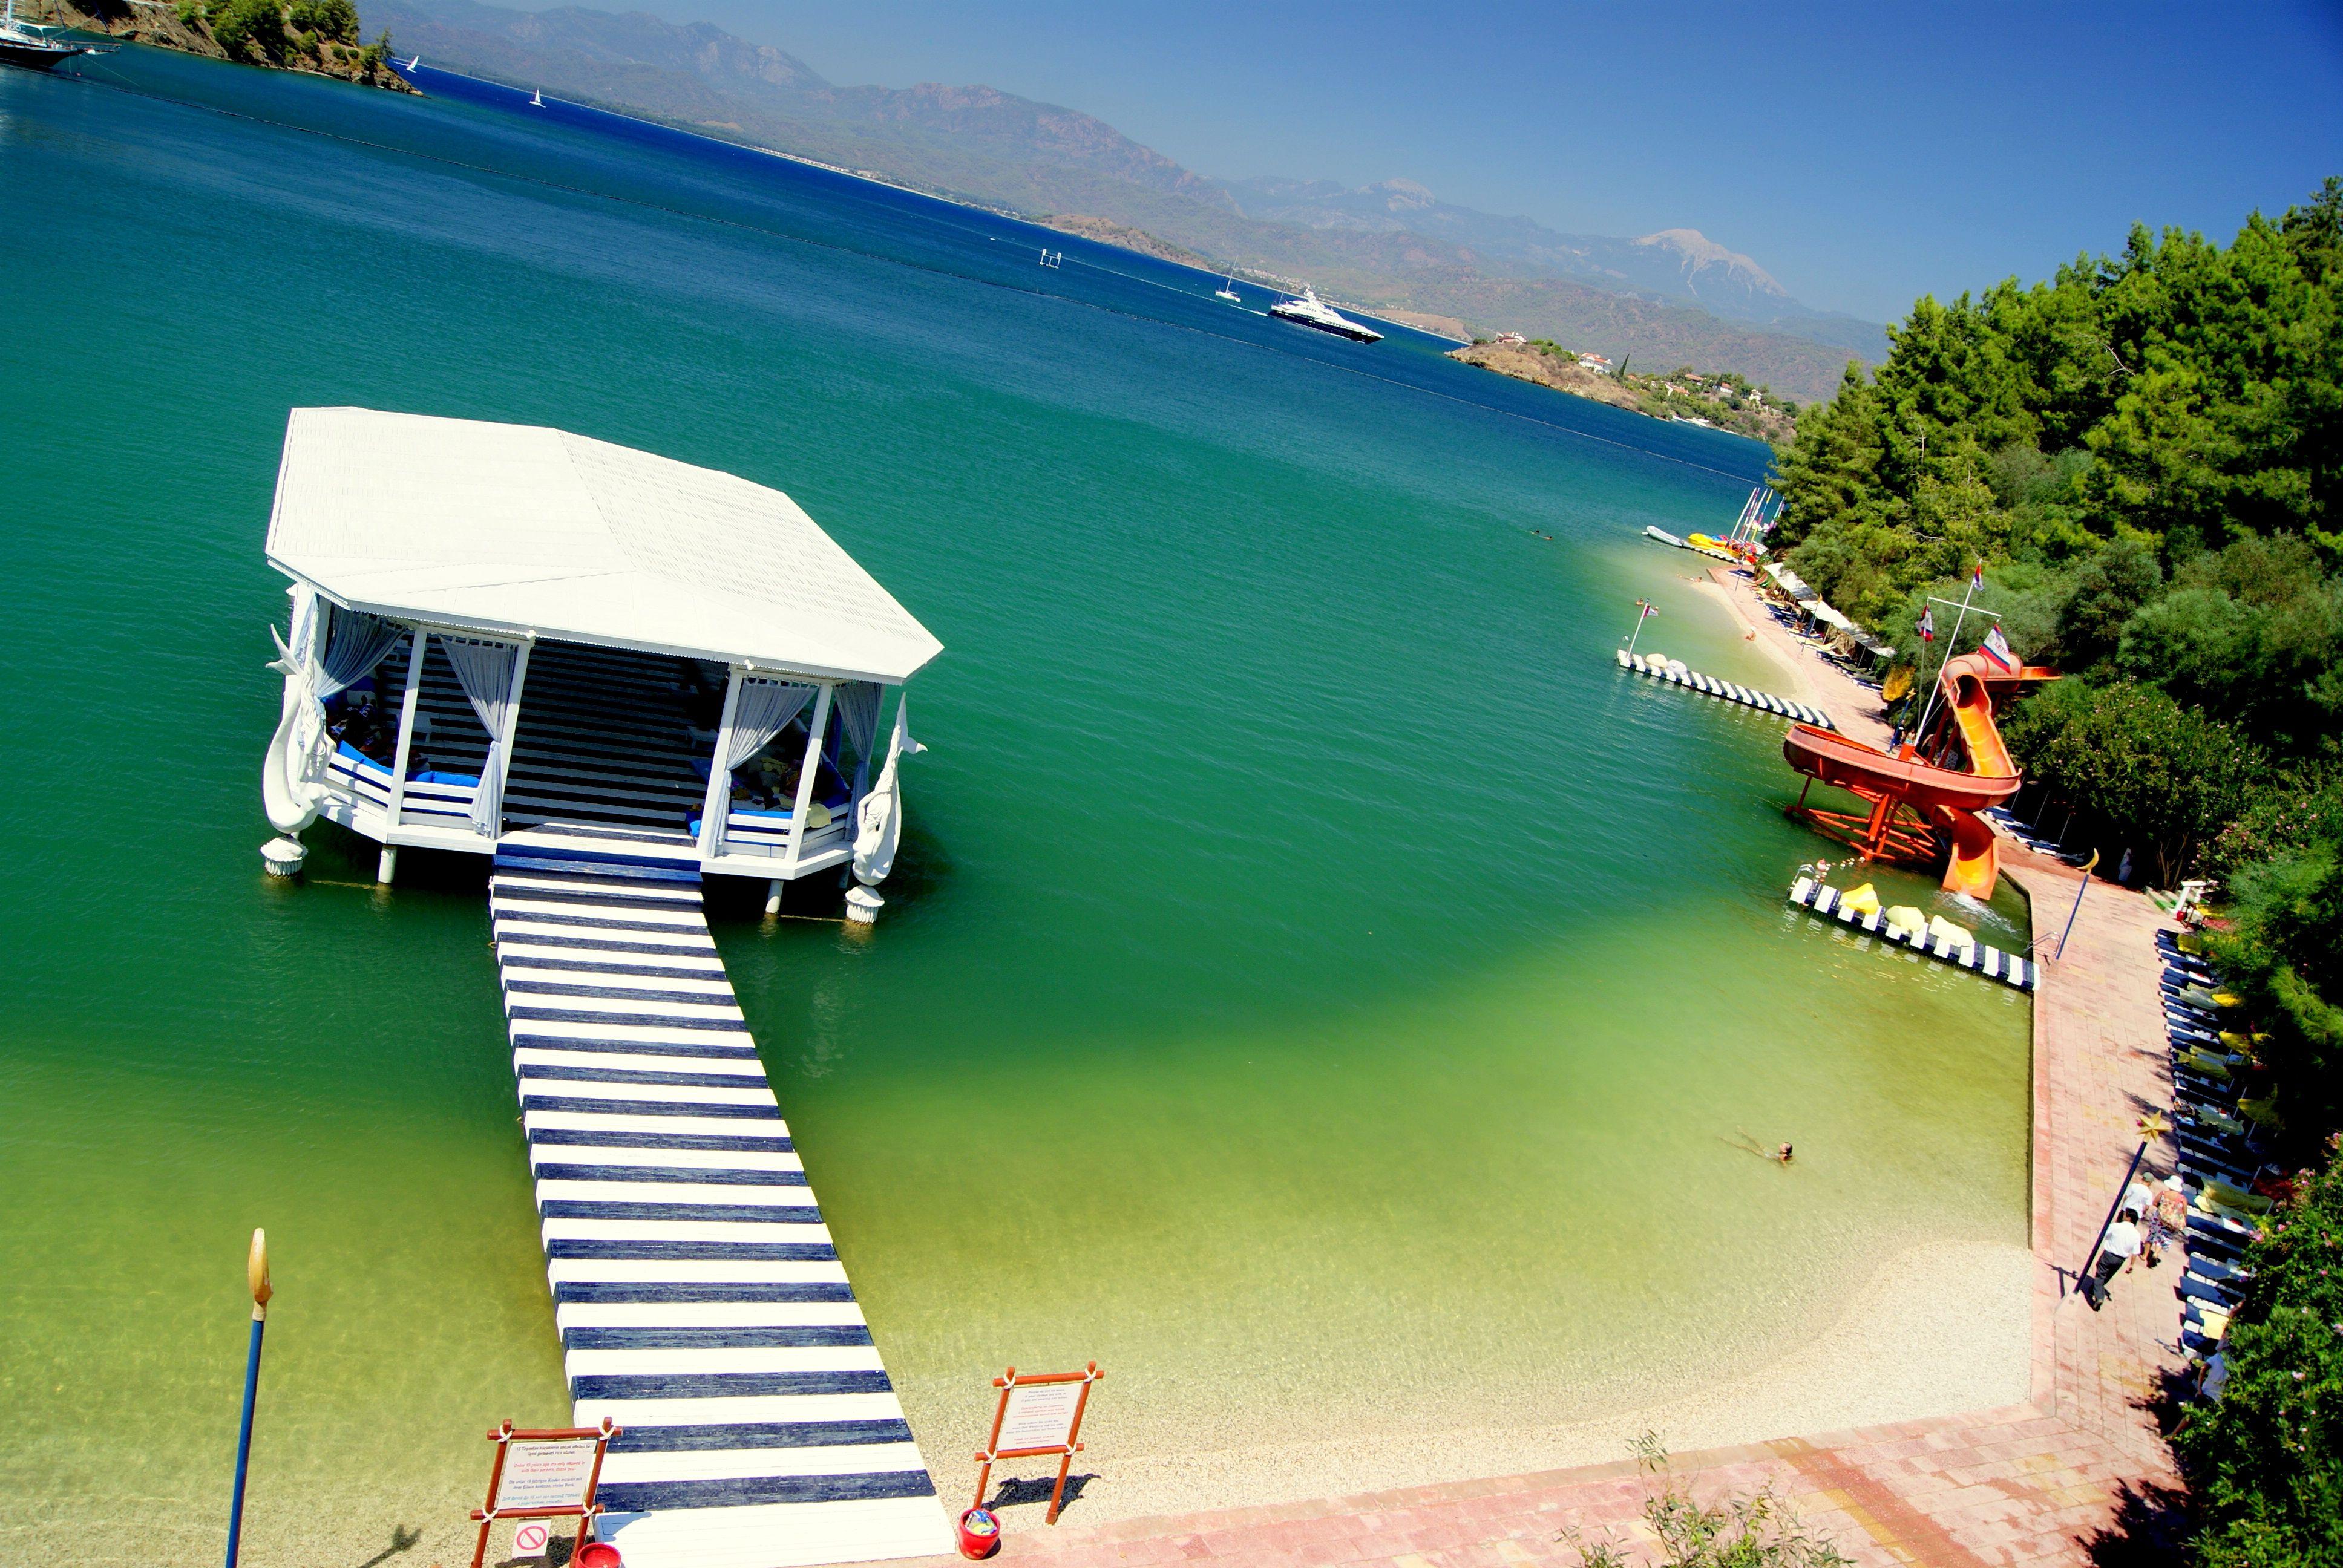 Summer In Fethiye Turkey By 1lifesoliveit On Deviantart Fethiye Turkey Places Turkey